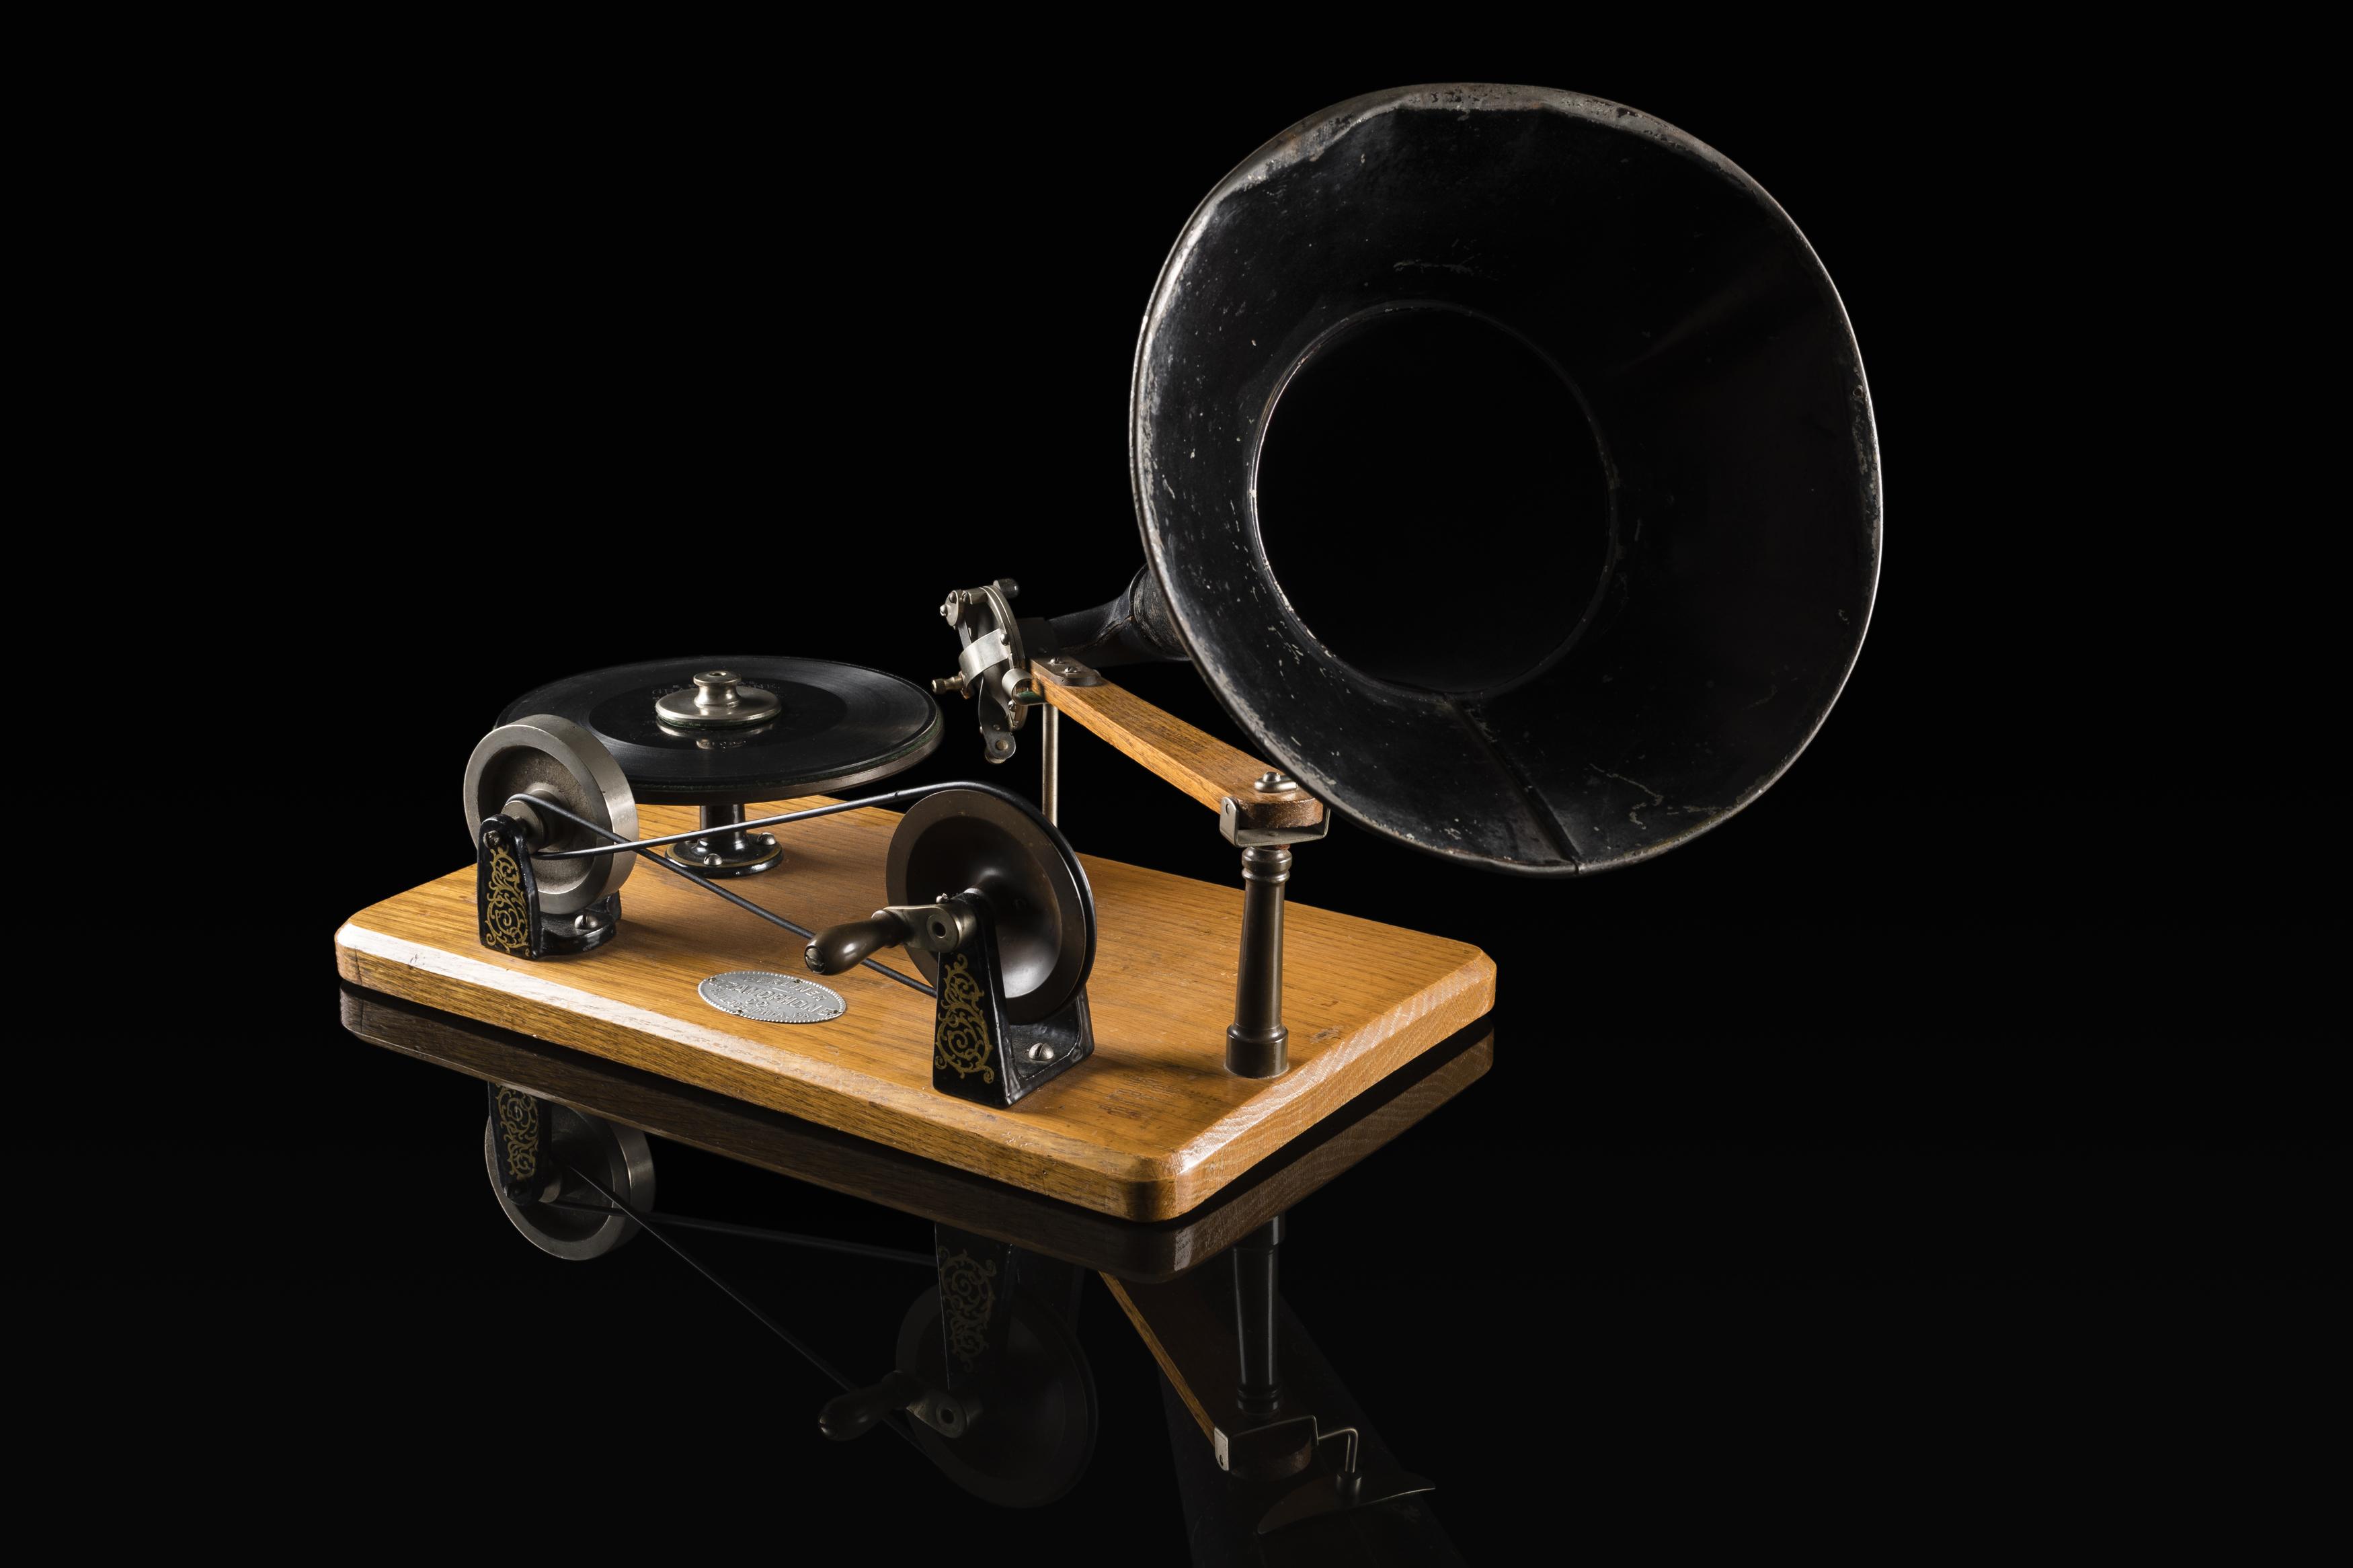 94/57/1-1/1 Gramophone, metal / wood / neoprene, made by Berliner Gramophone Co, USA, 1893-1896.